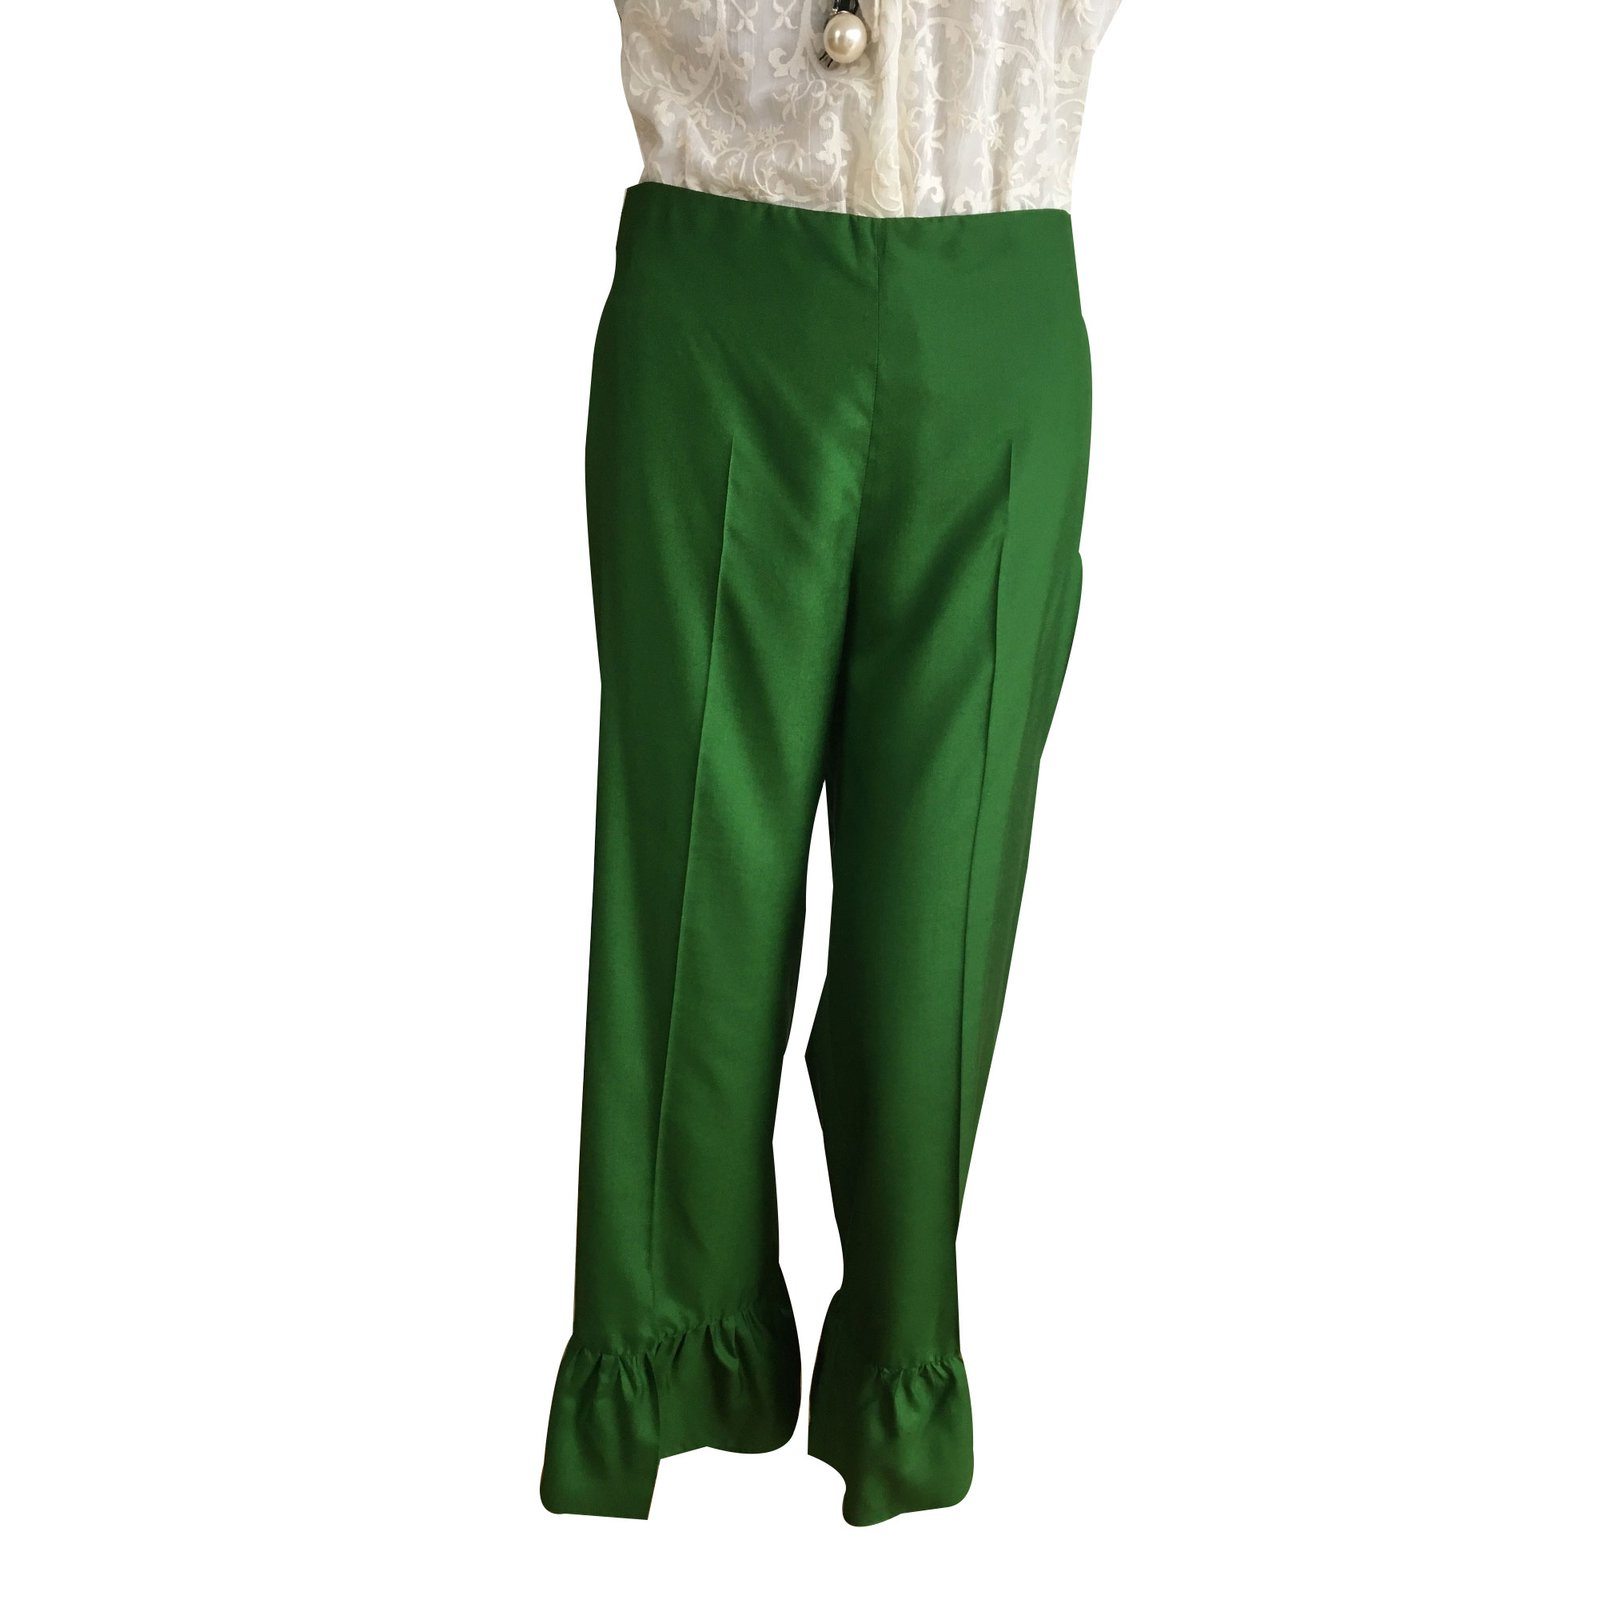 gucci pants. gucci pant, legging pants, leggings silk green ref.35501 pants